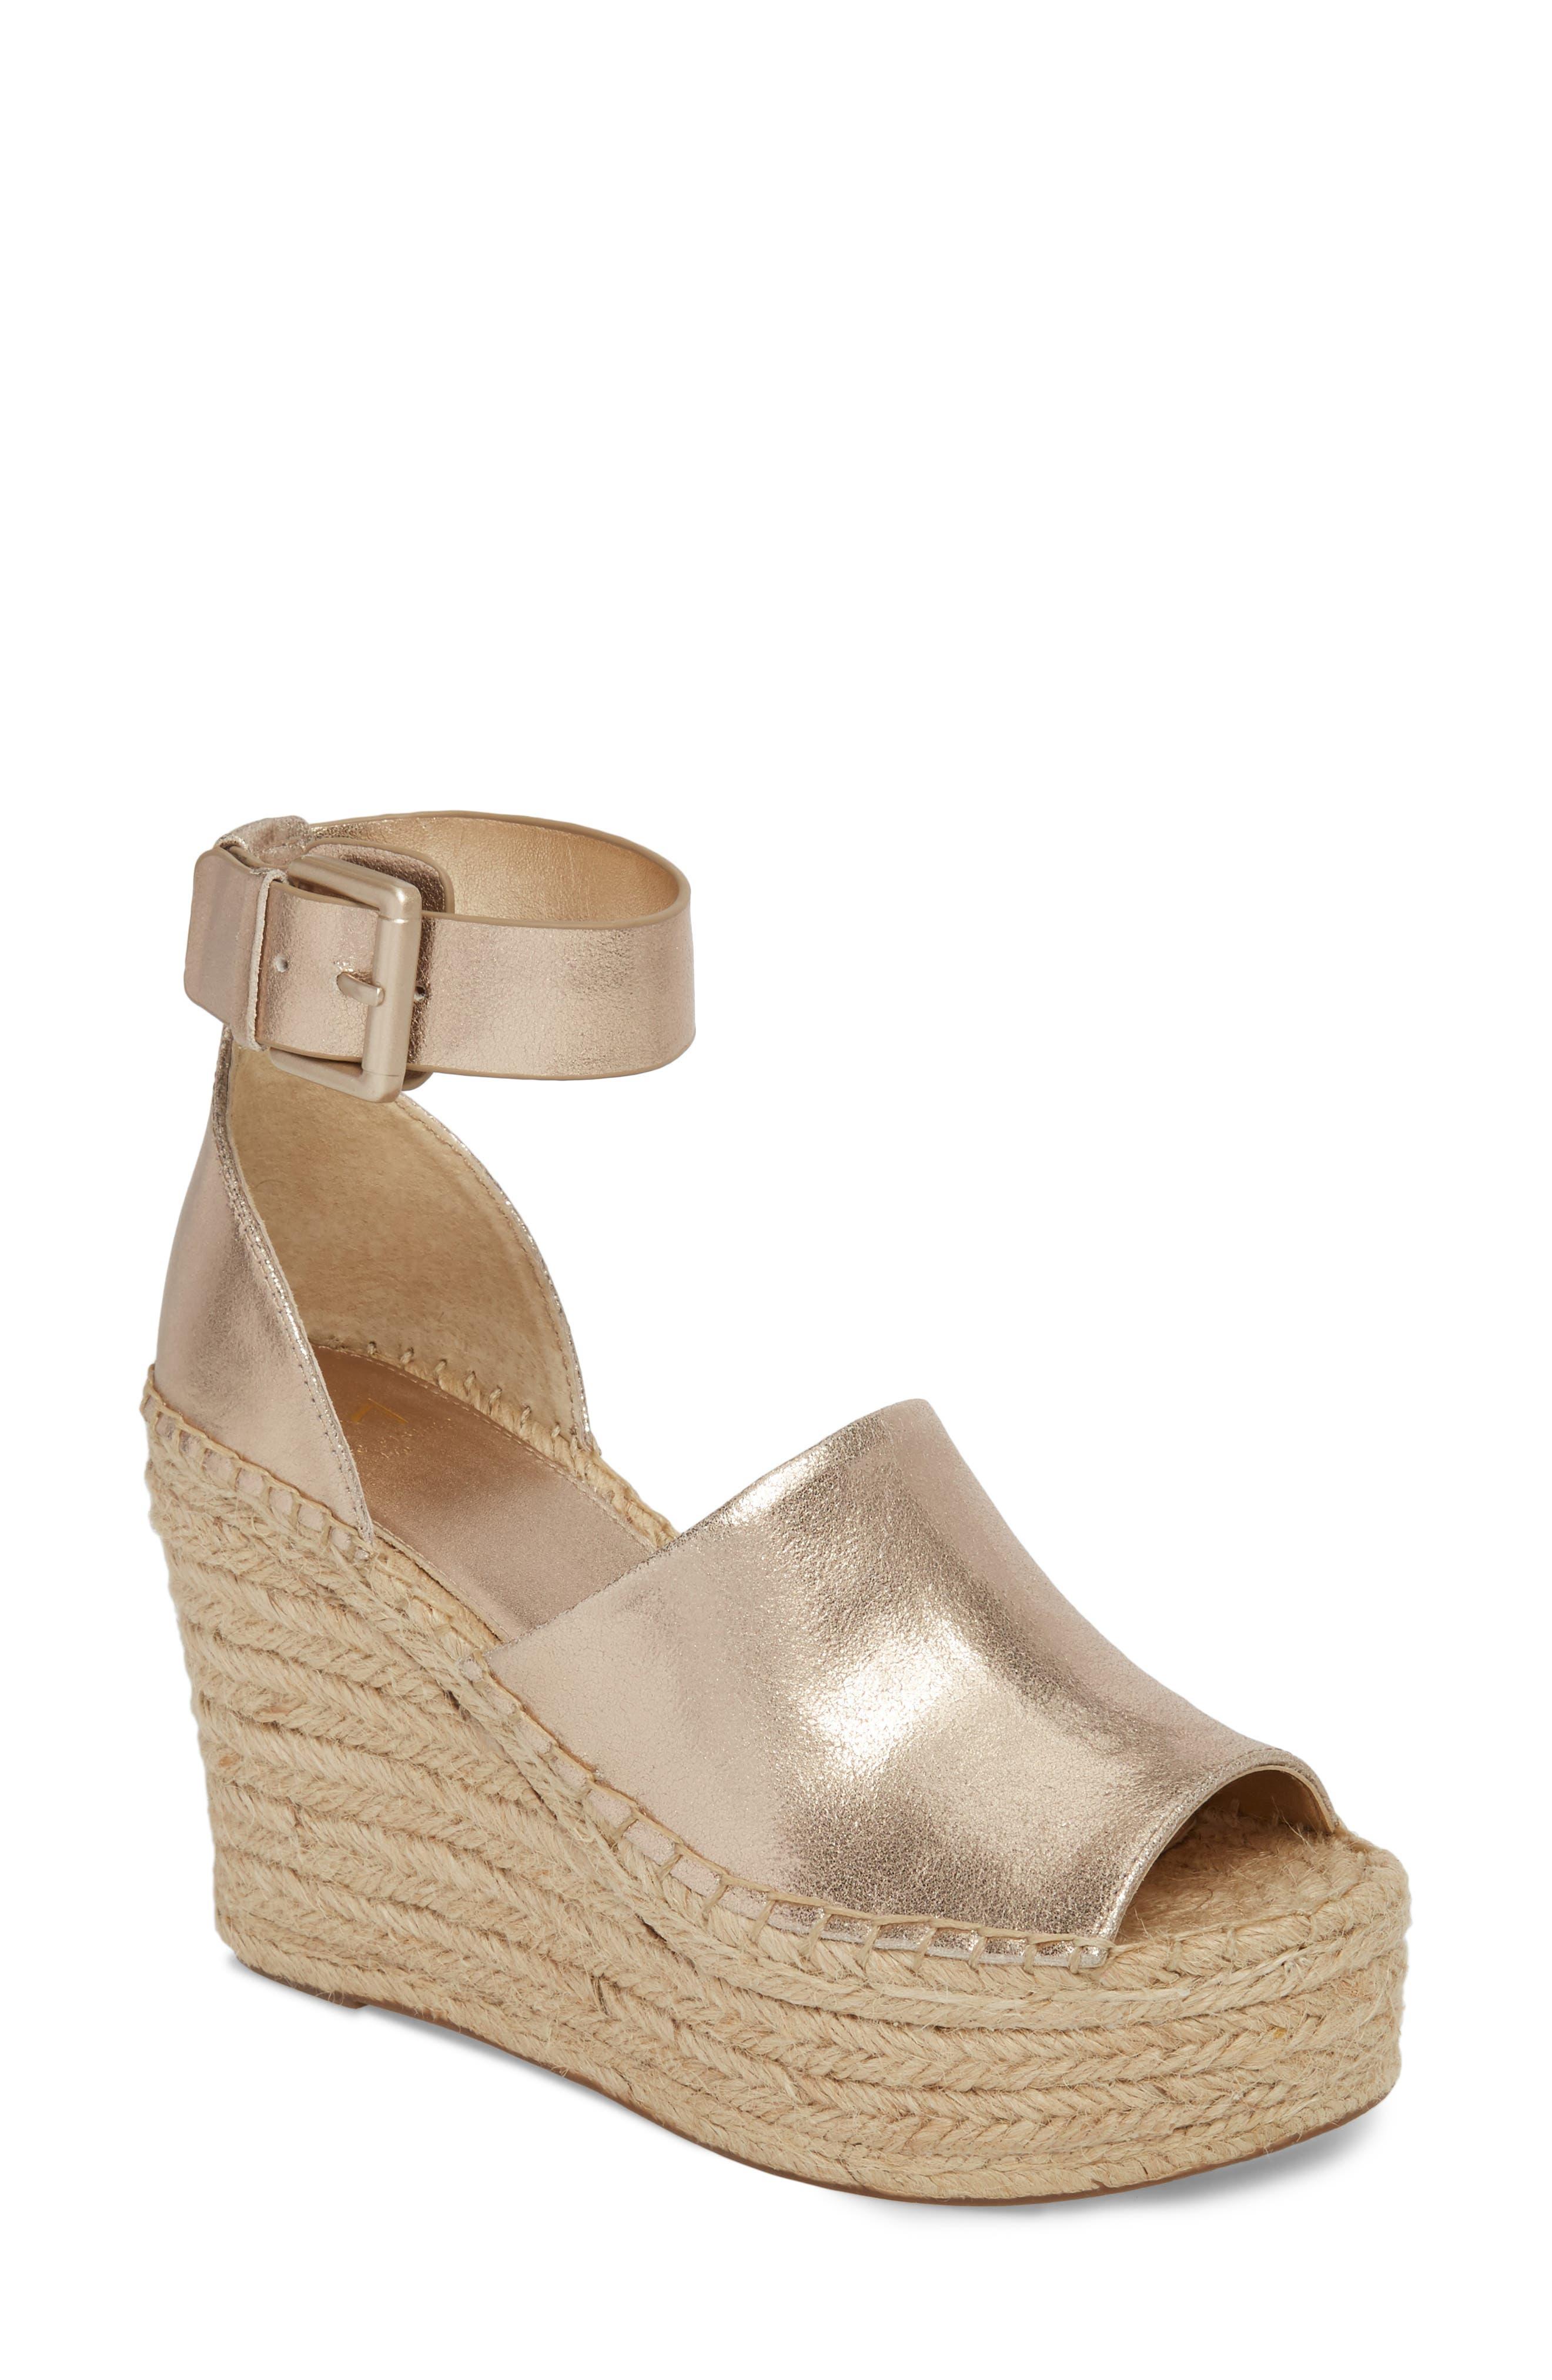 Ladies Metallic Silver Rose Gold LeatherSummer Comfort Wedge Sandals